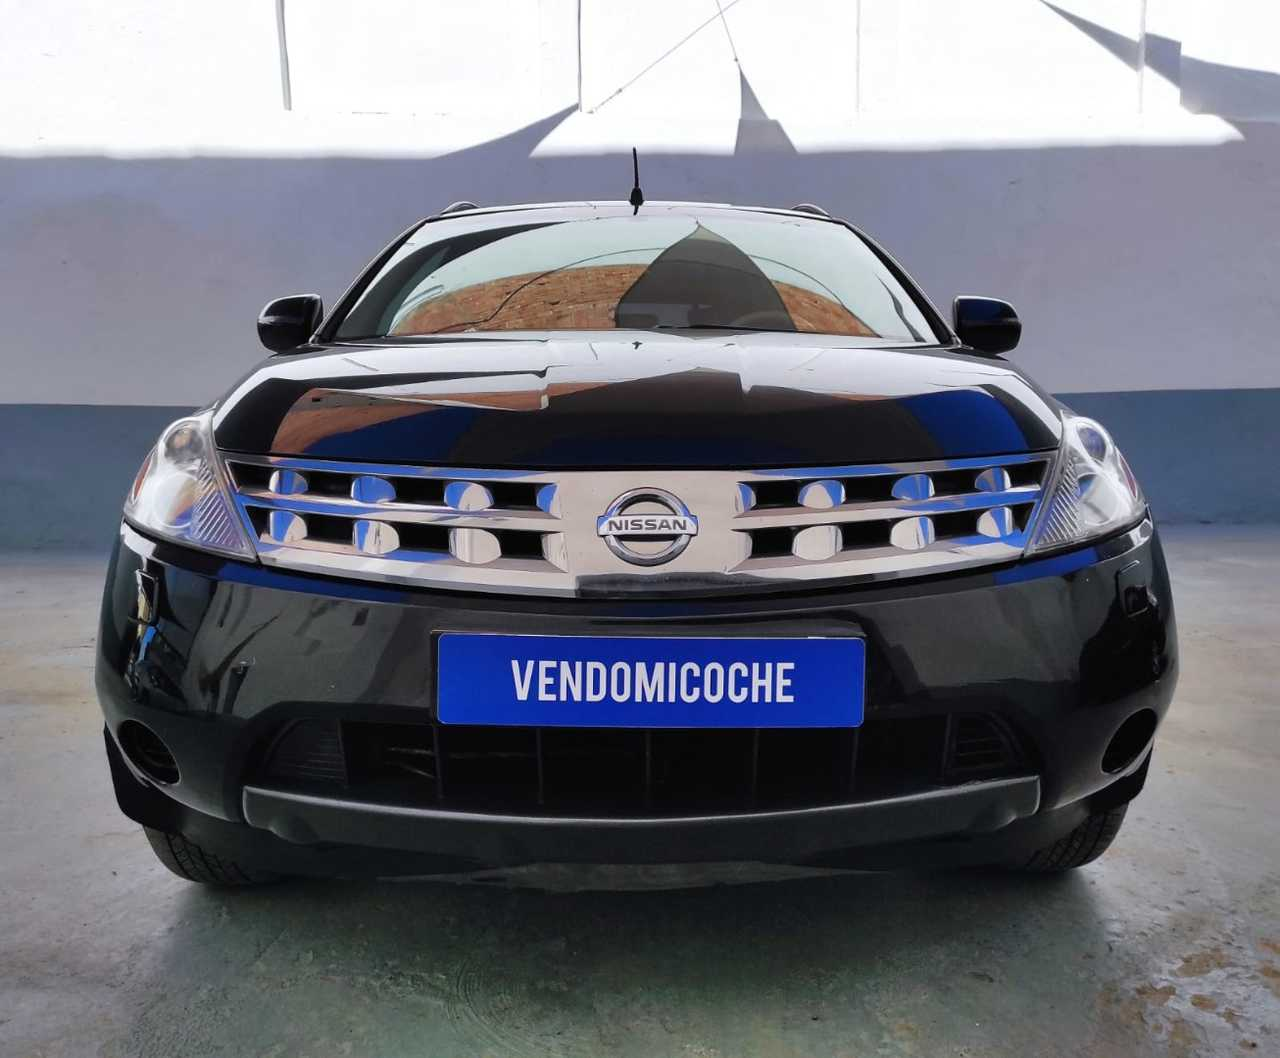 Nissan Murano 3.5 V6 234CV Gran Turismo CVT 5p 5p.   - Foto 1